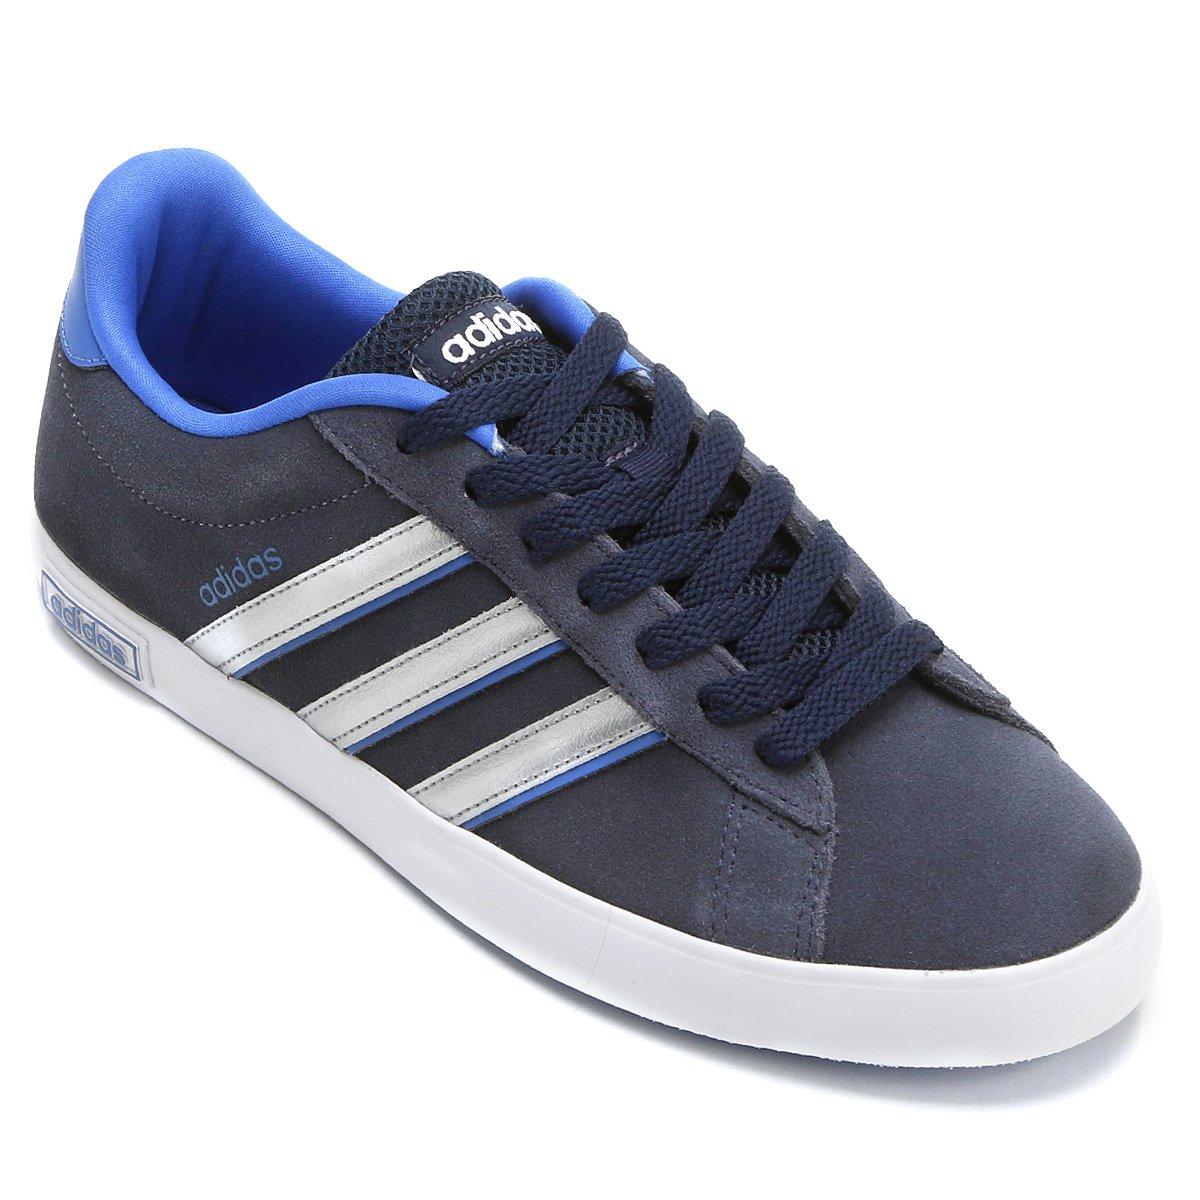 be451ee41de Tênis Adidas Derby Vulc Suede - Compre Agora